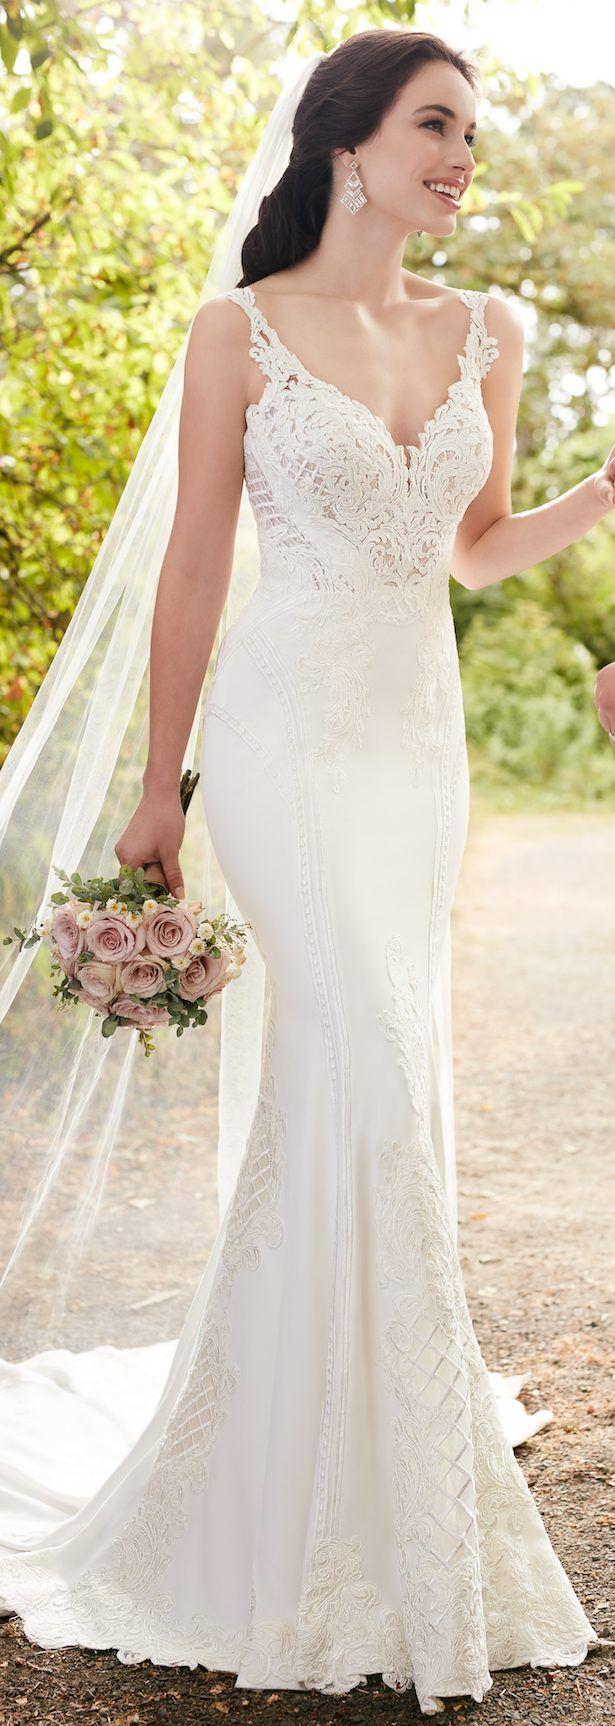 Wedding-Dresses-0855